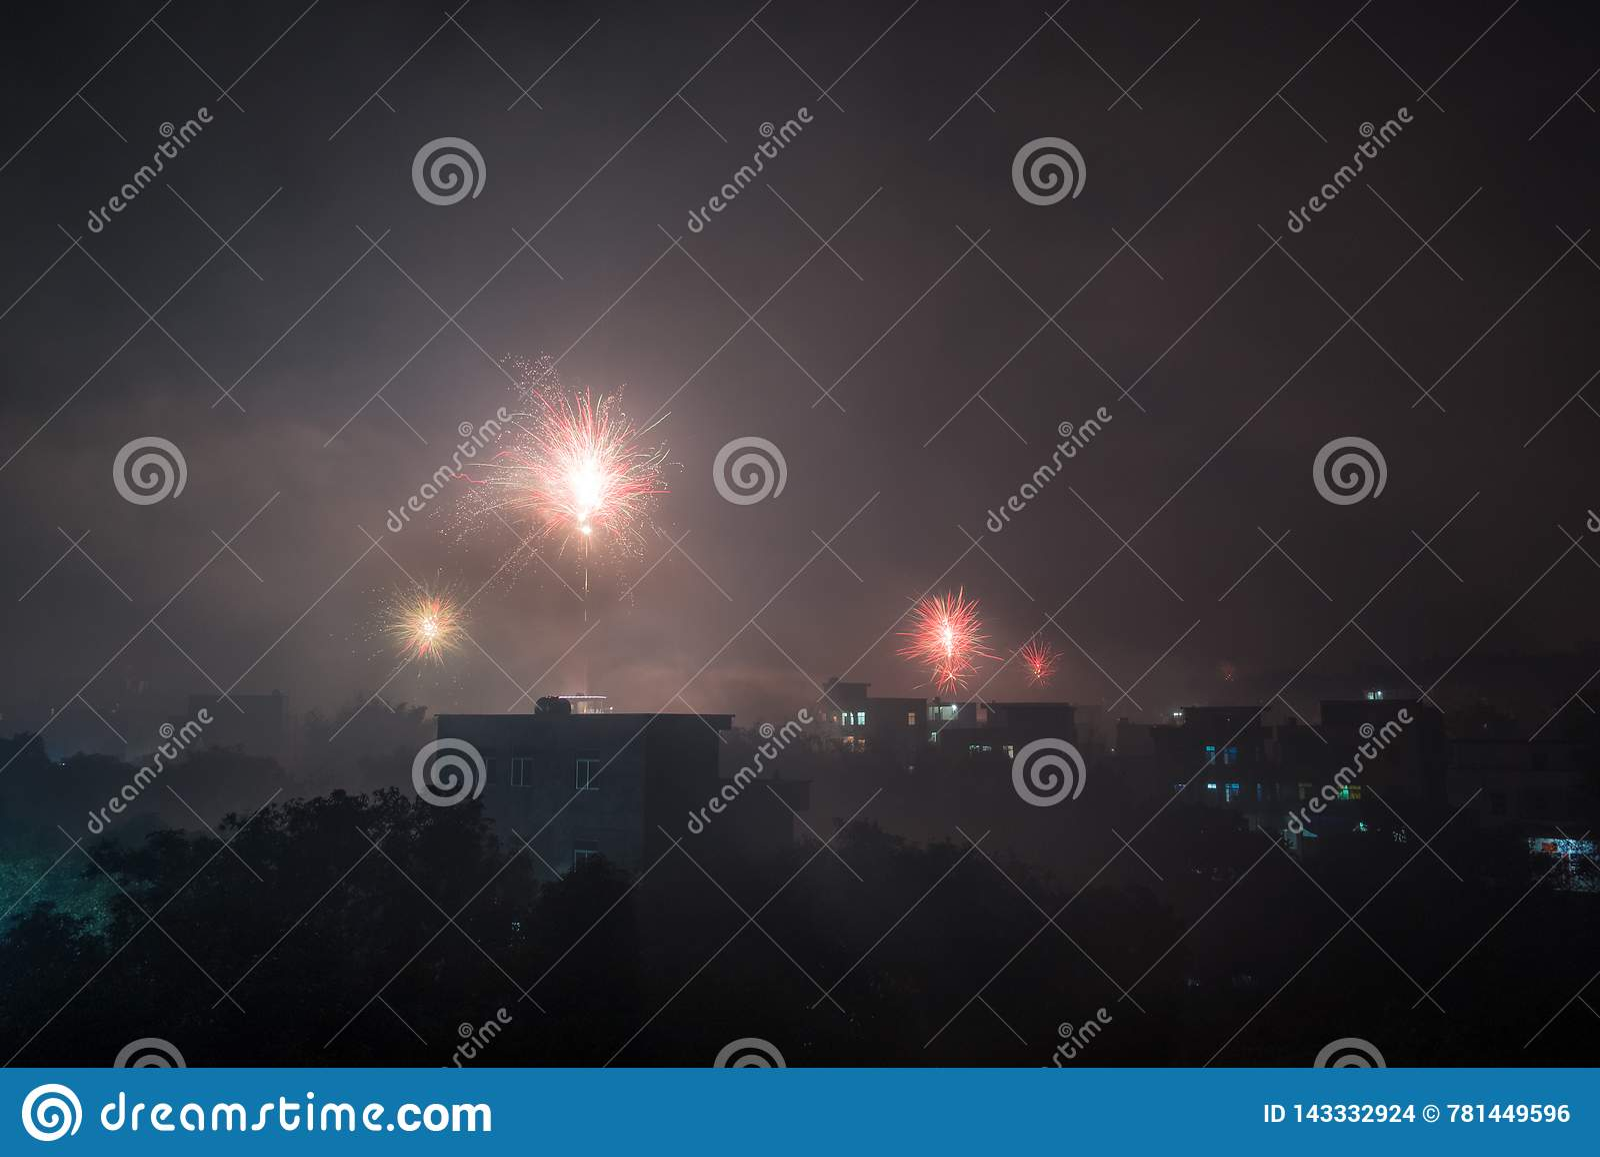 Fantastic firework